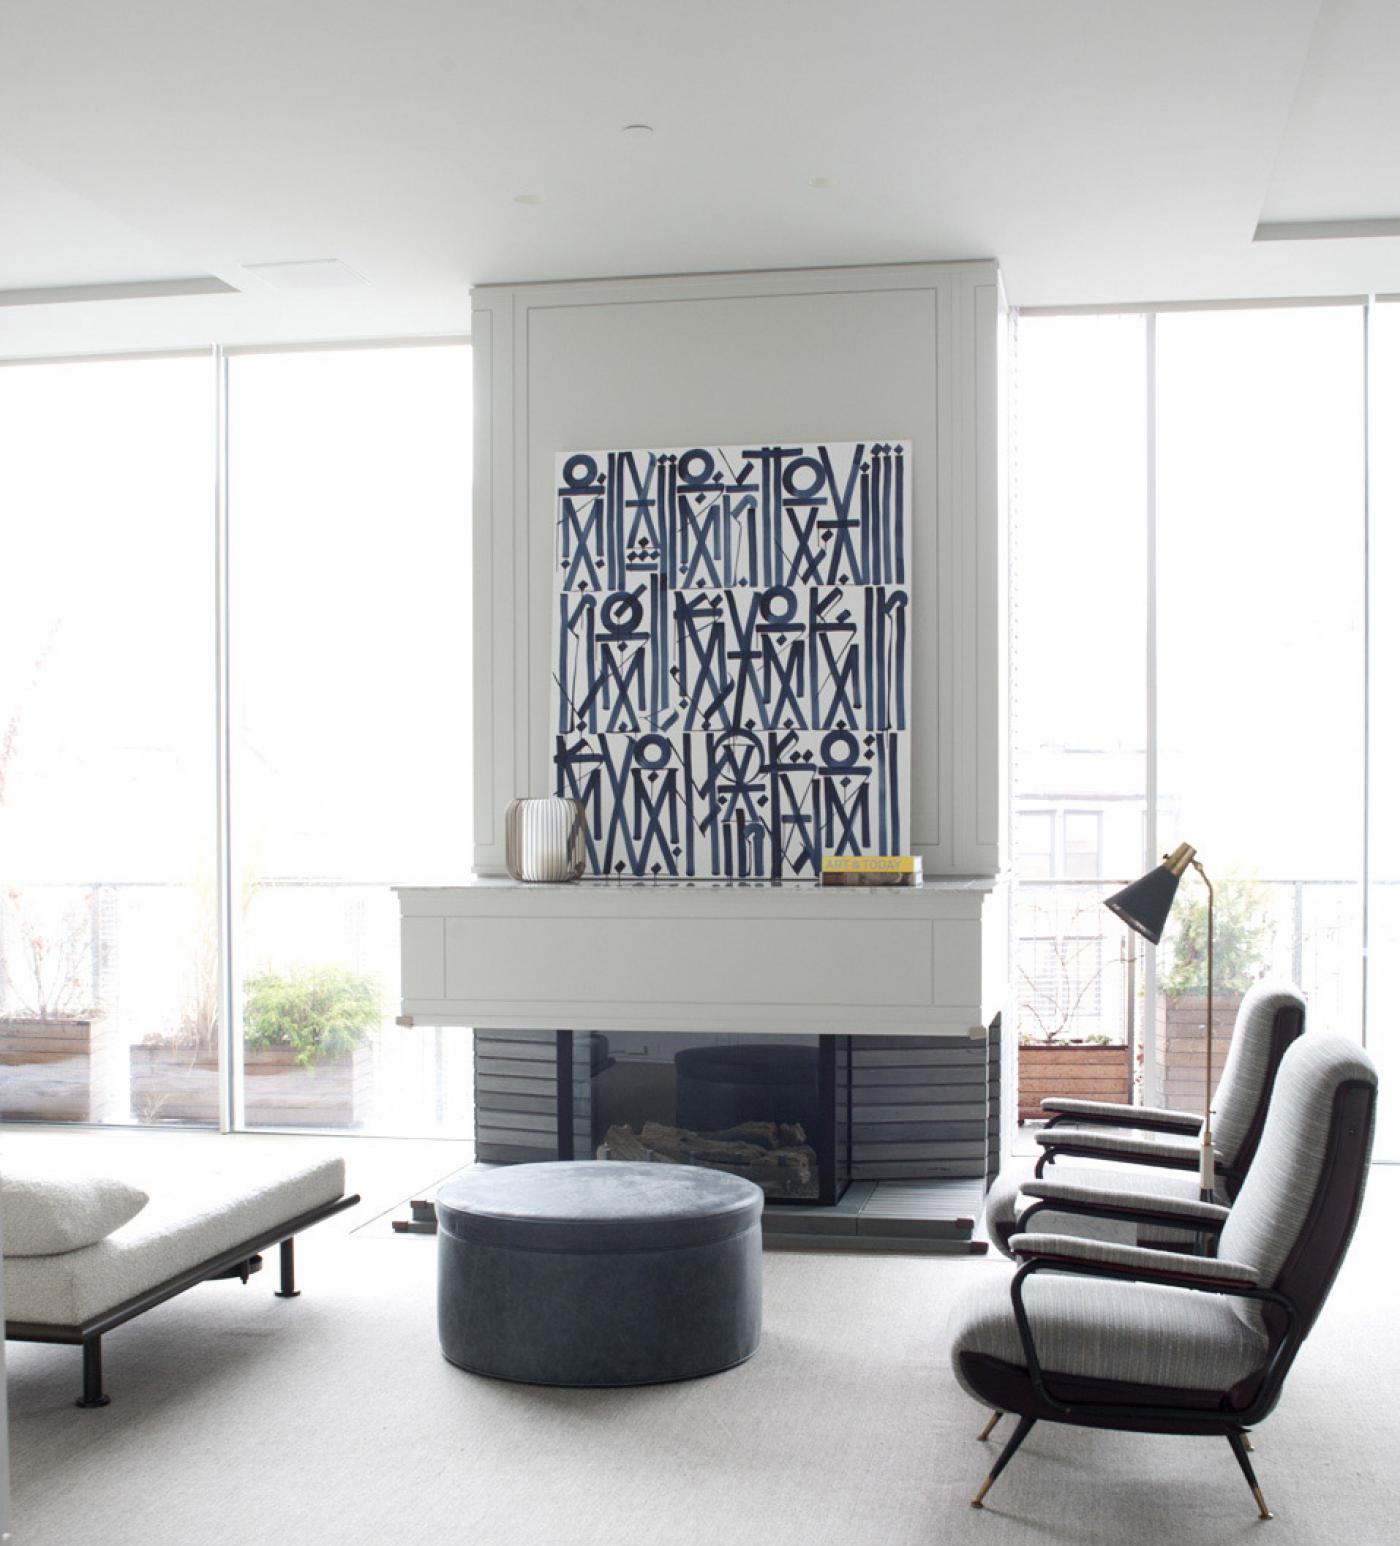 Shawn Henderson Interior Design Bond Street Shawnhenderson Image Title